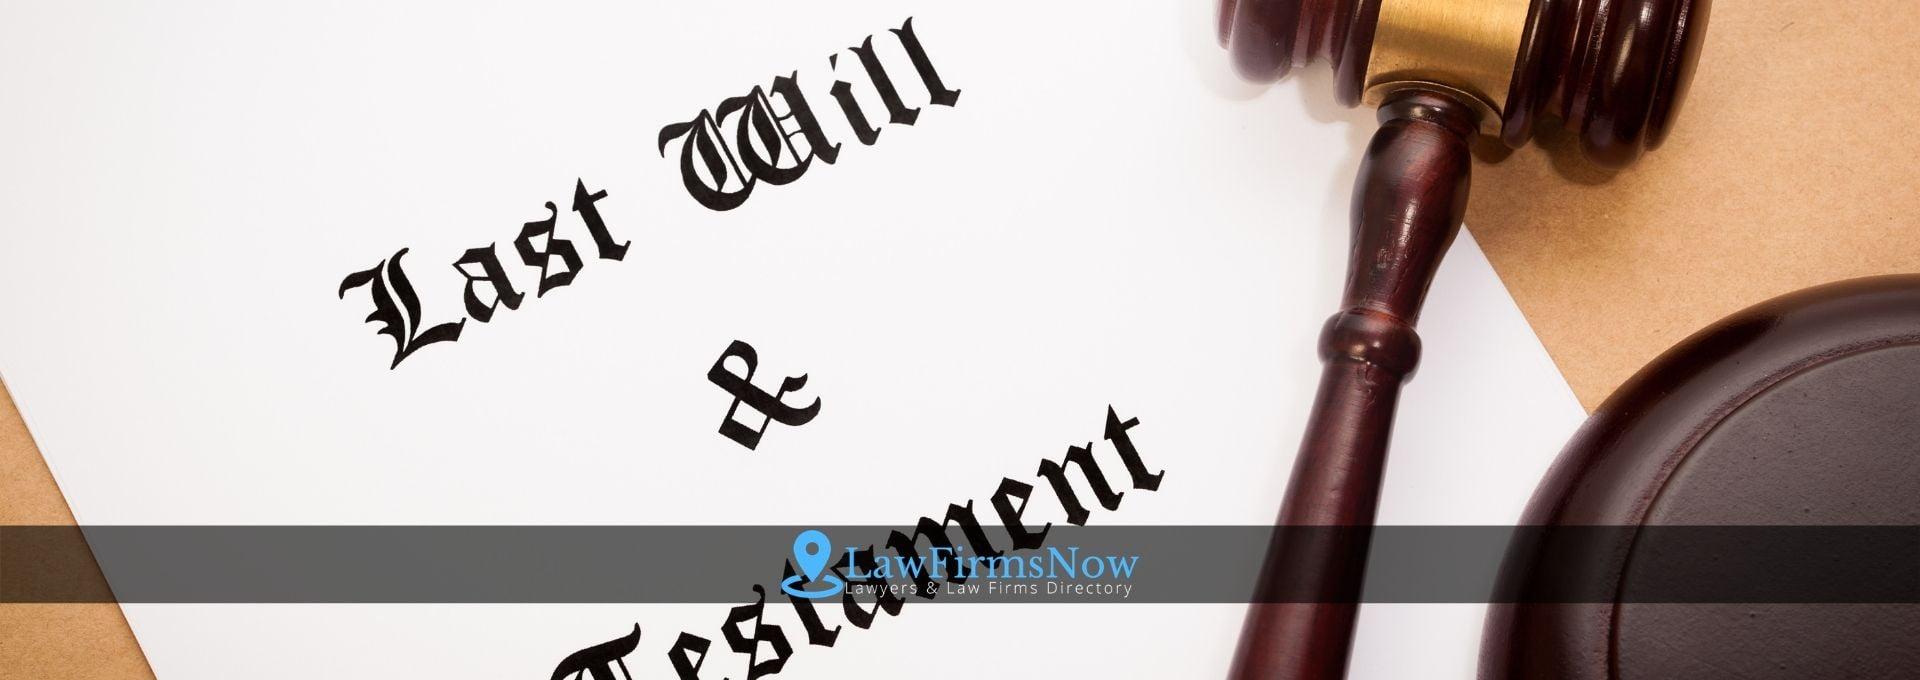 Last wills and statement